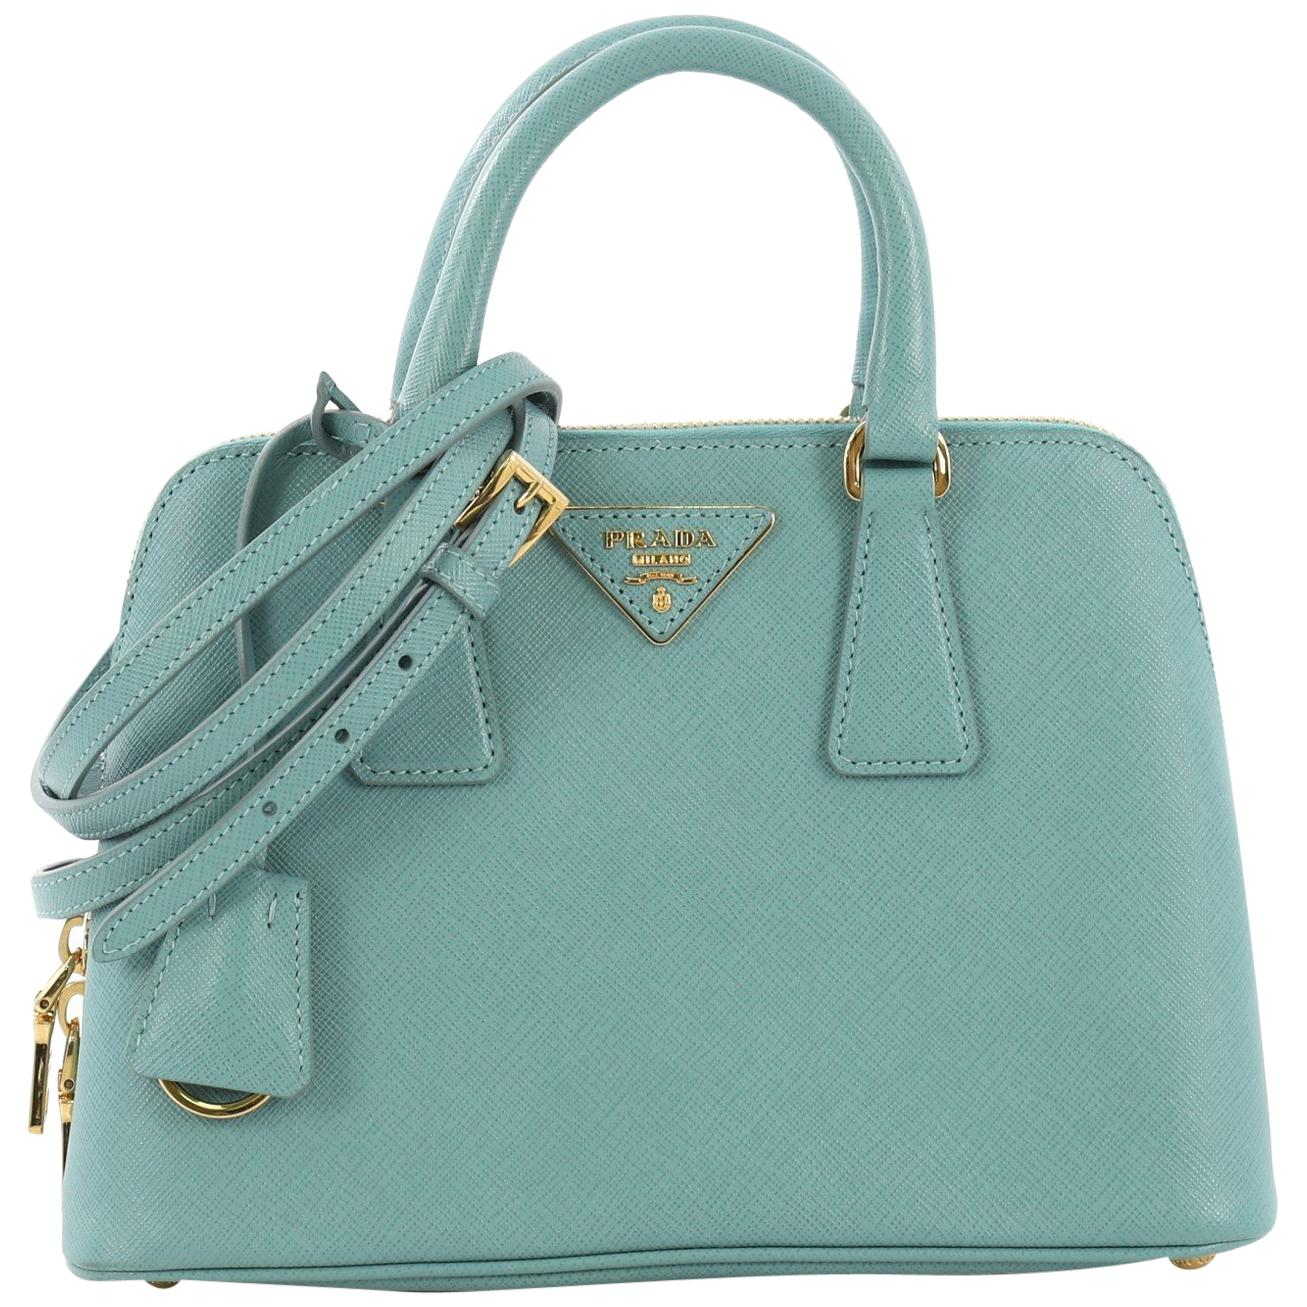 41b85c473327 Vintage Prada: Bags, Shoes, Dresses & More - 2,001 For Sale at 1stdibs